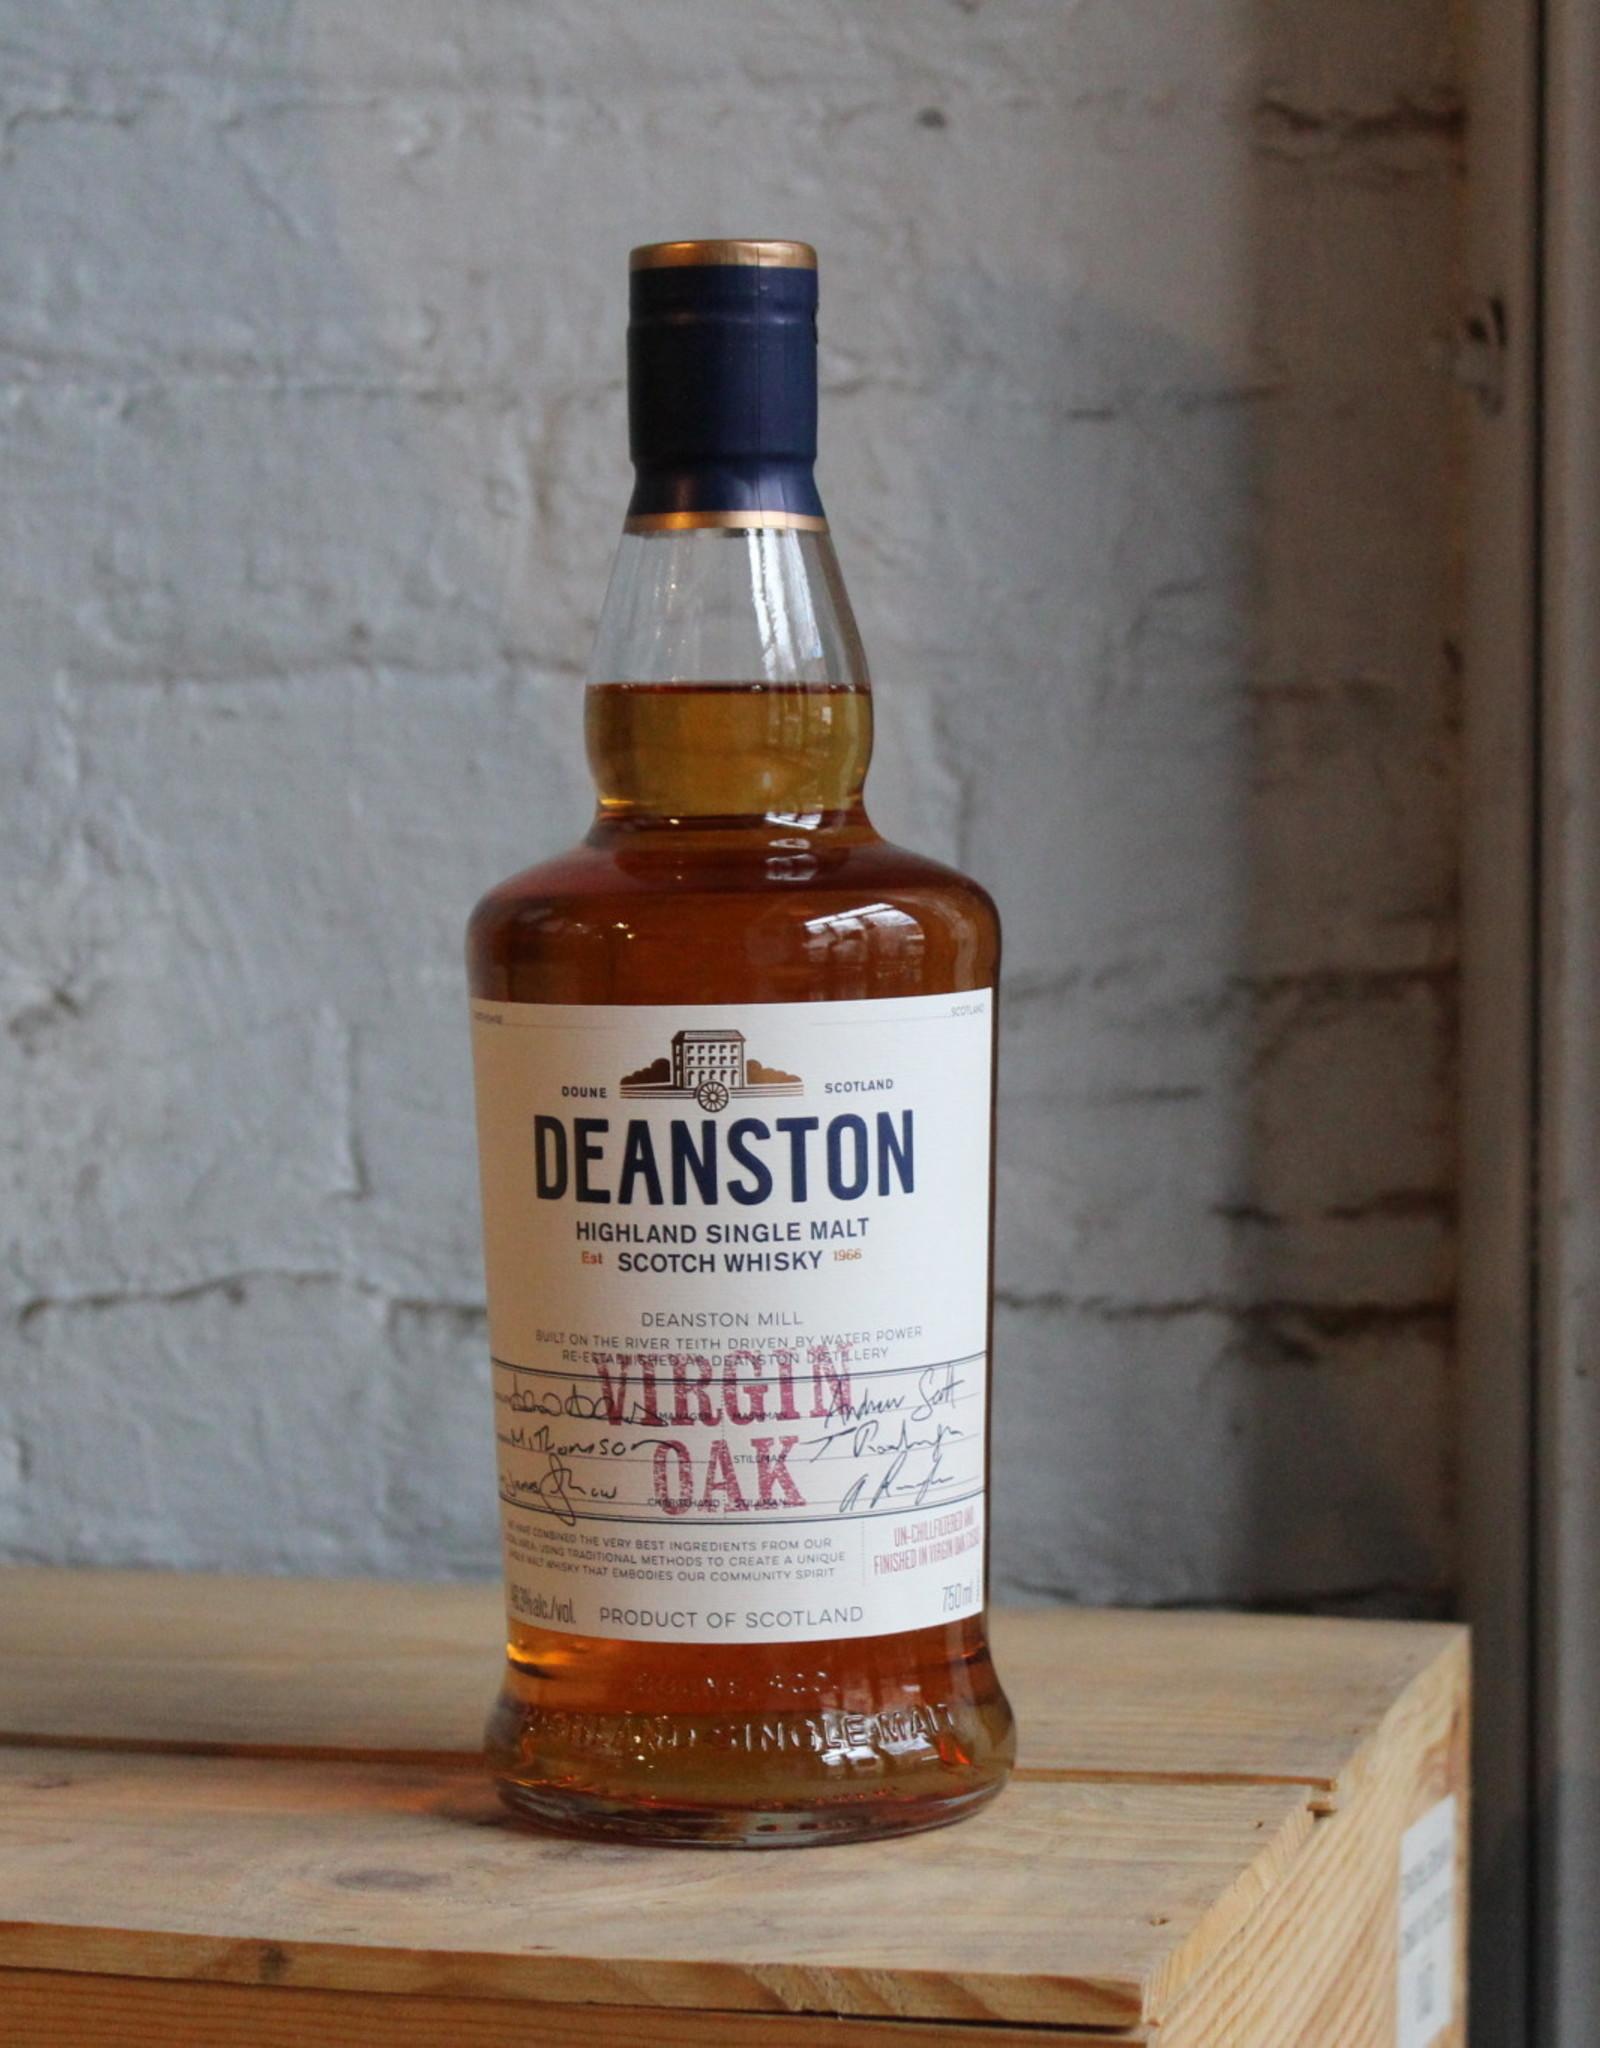 Deanston Virgin Oak Single Malt Scotch Whisky - Highland, Scotland (750ml)